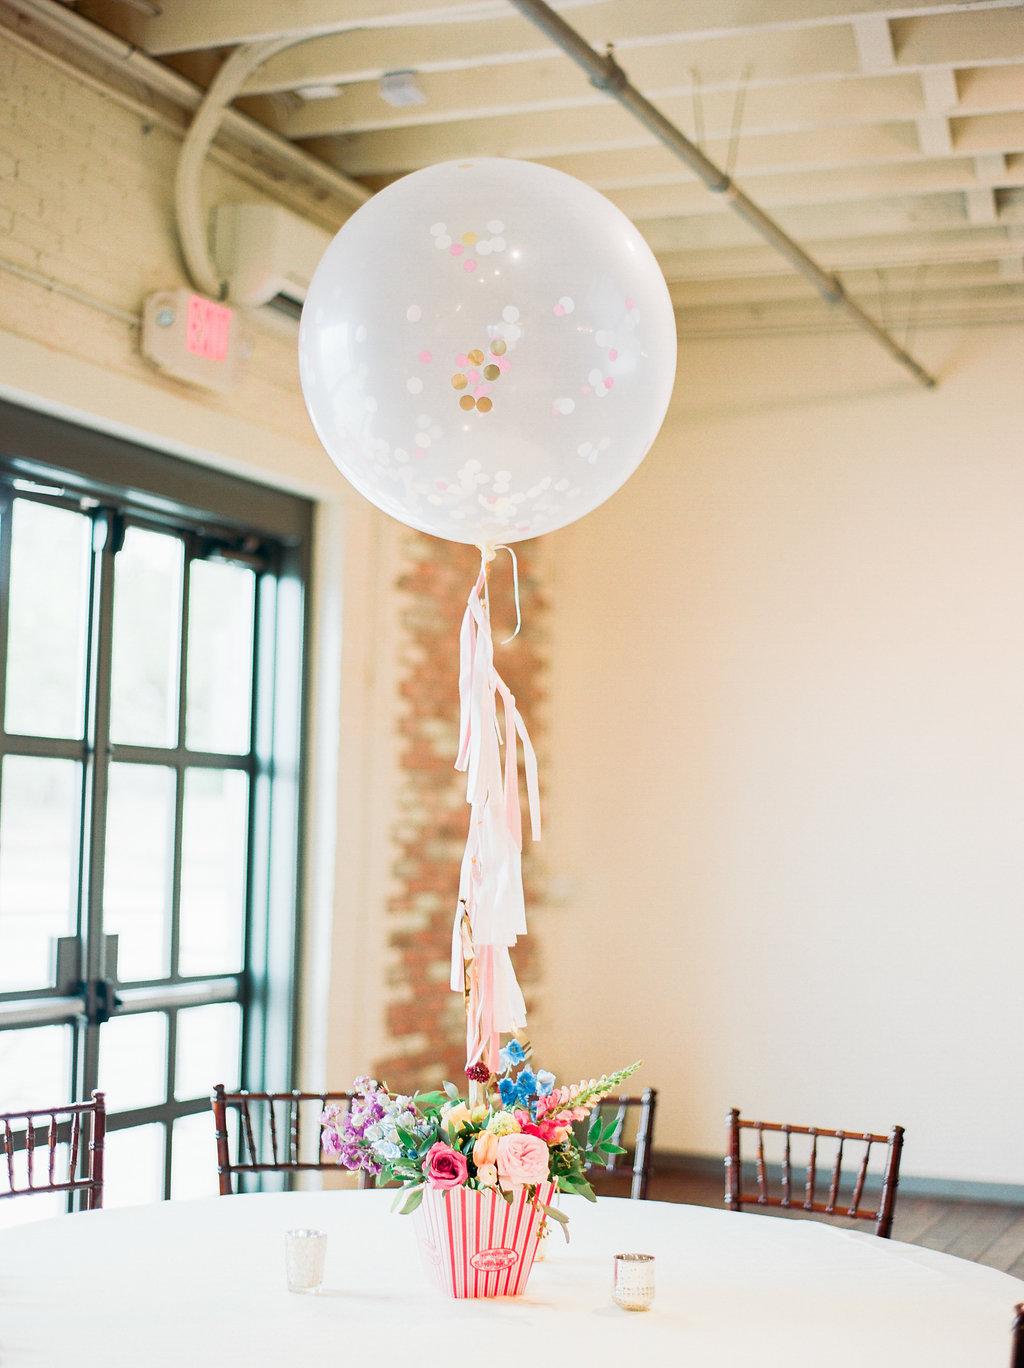 balloon centerpieces - https://ruffledblog.com/modern-playful-texas-carnival-wedding